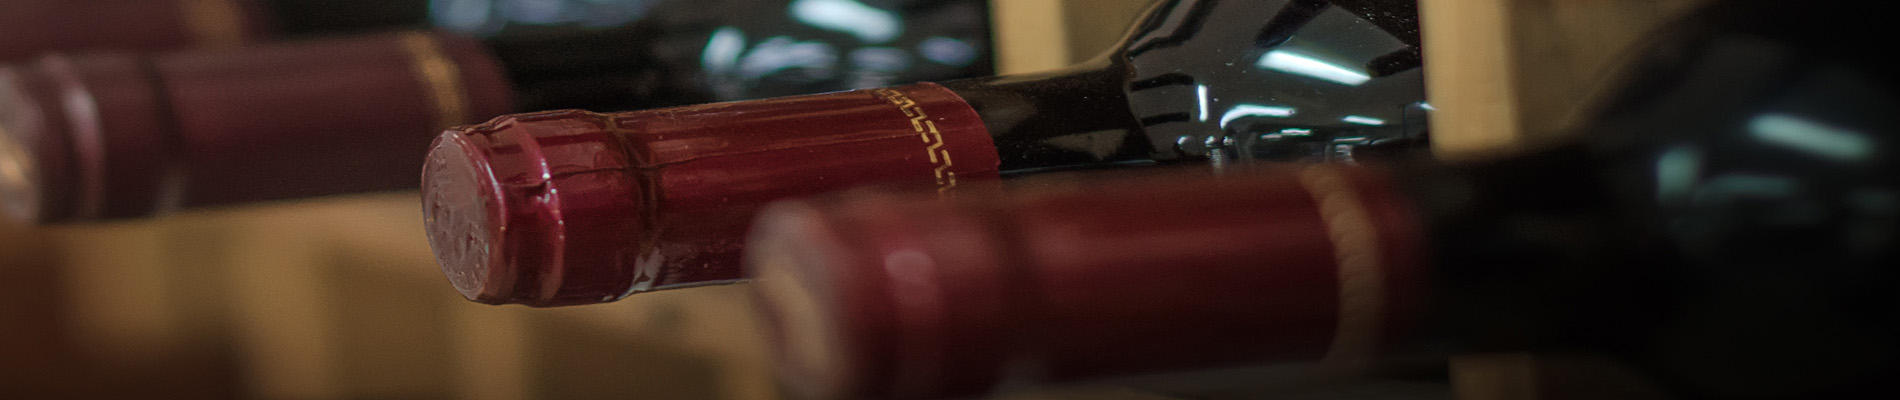 Boletín del vino, julio 2021